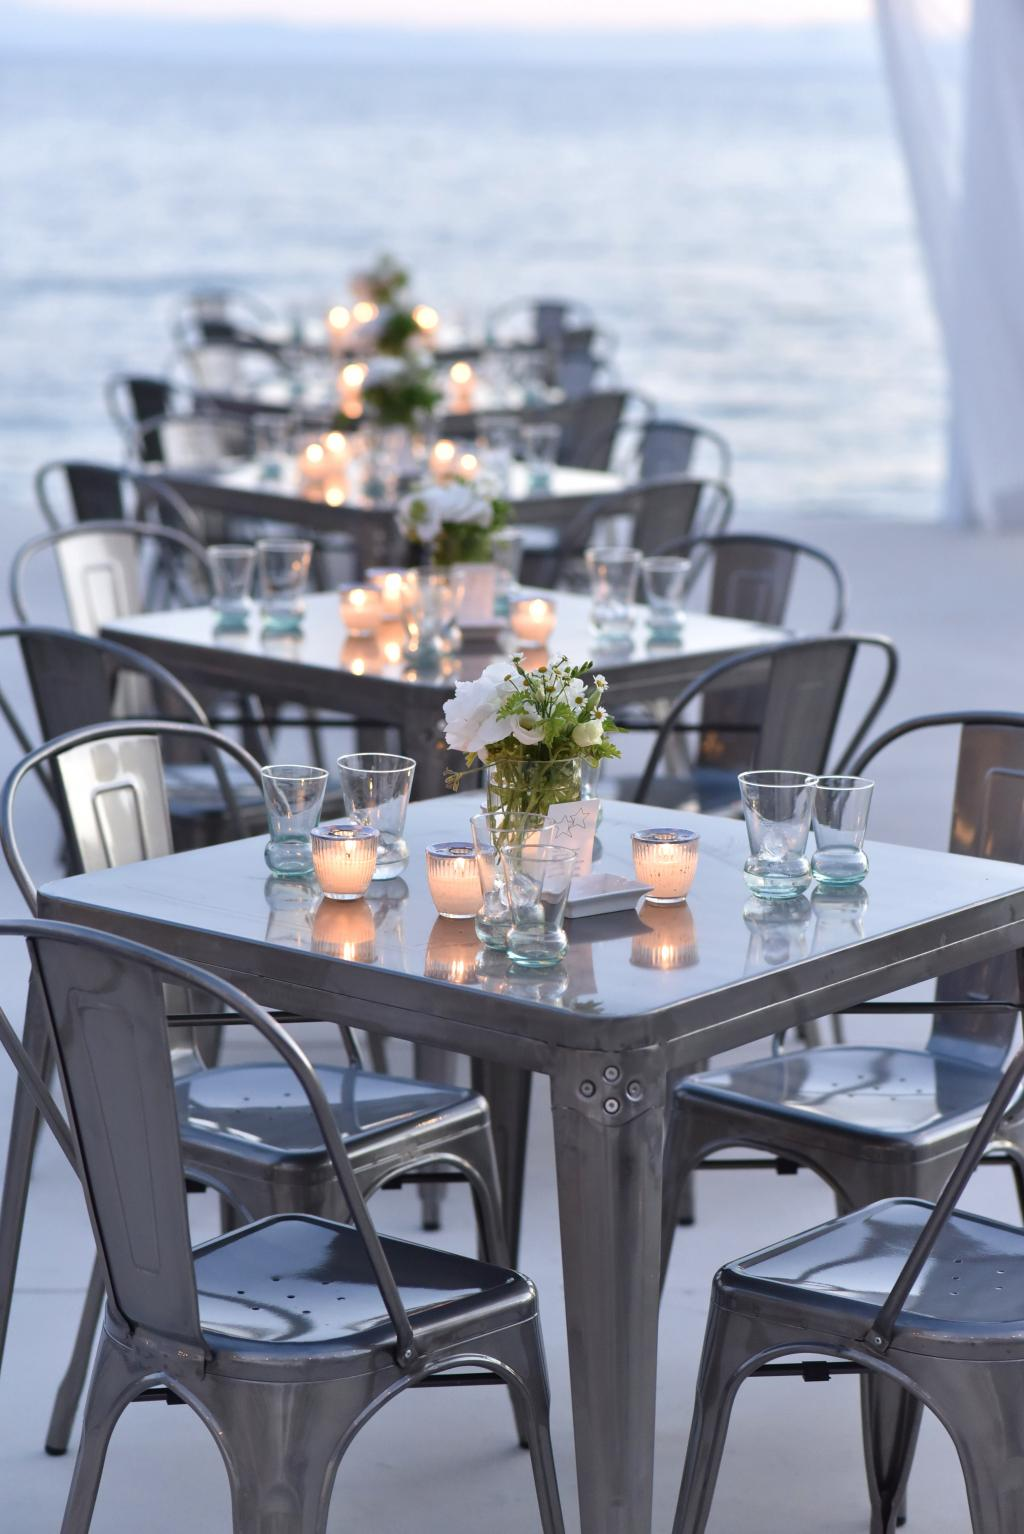 K&K Skiathos wedding - Image 5